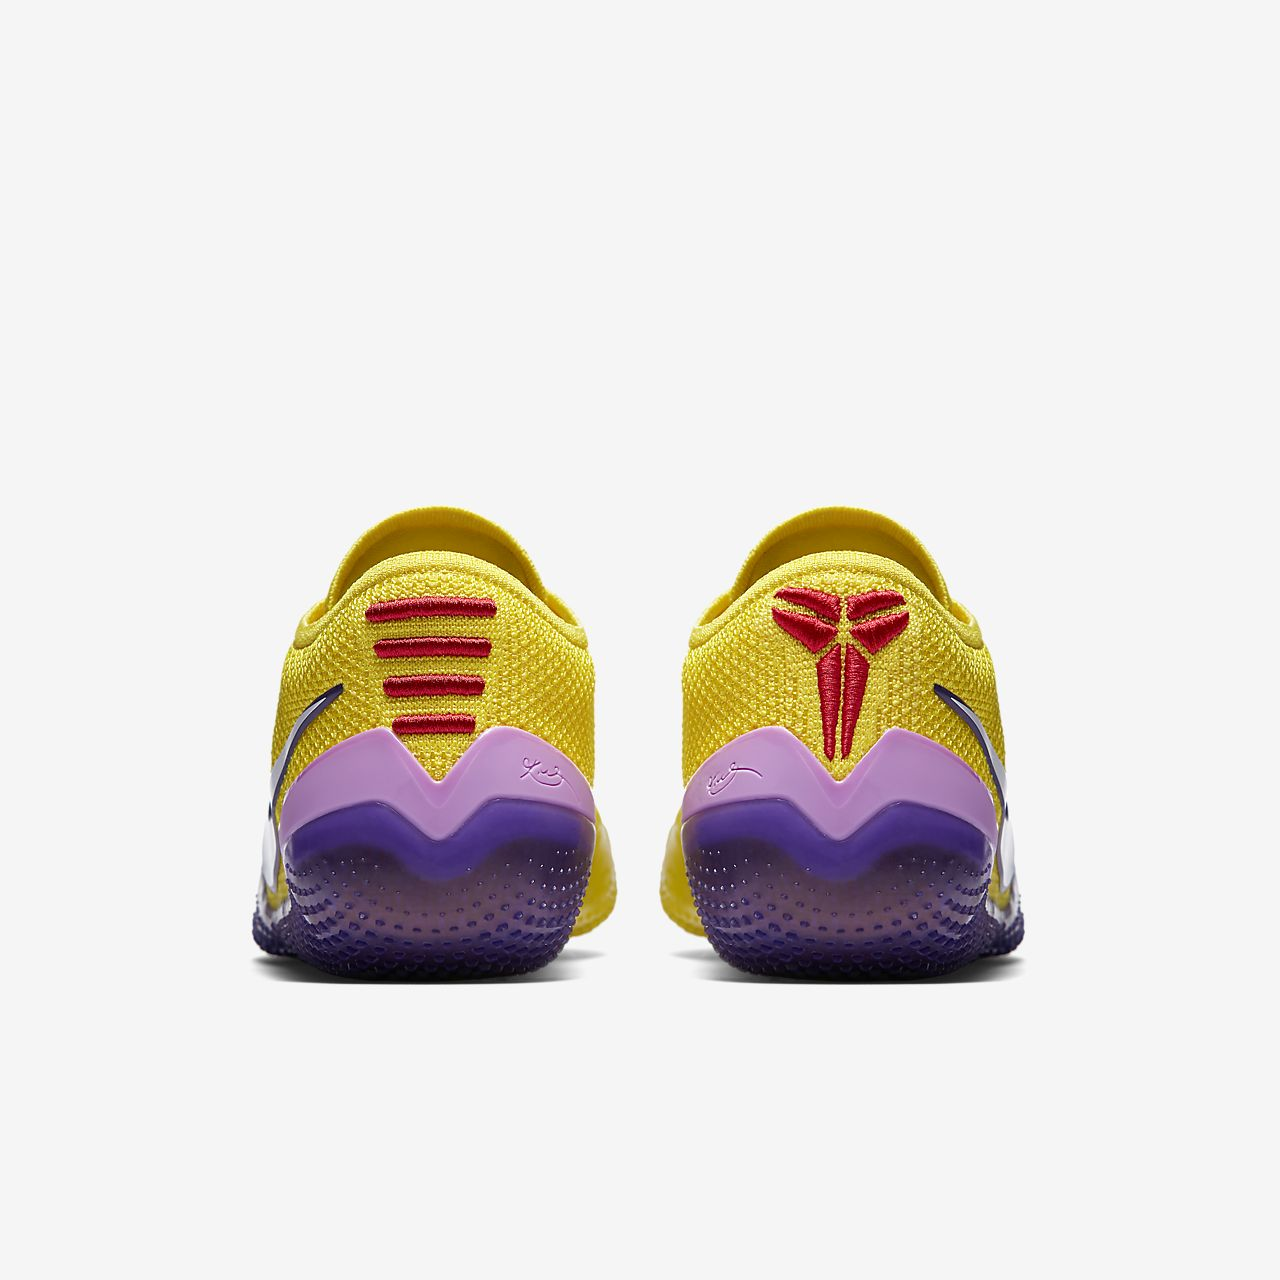 huge discount f0ee7 29449 ... Kobe A.D. NXT 360 Basketball Shoe